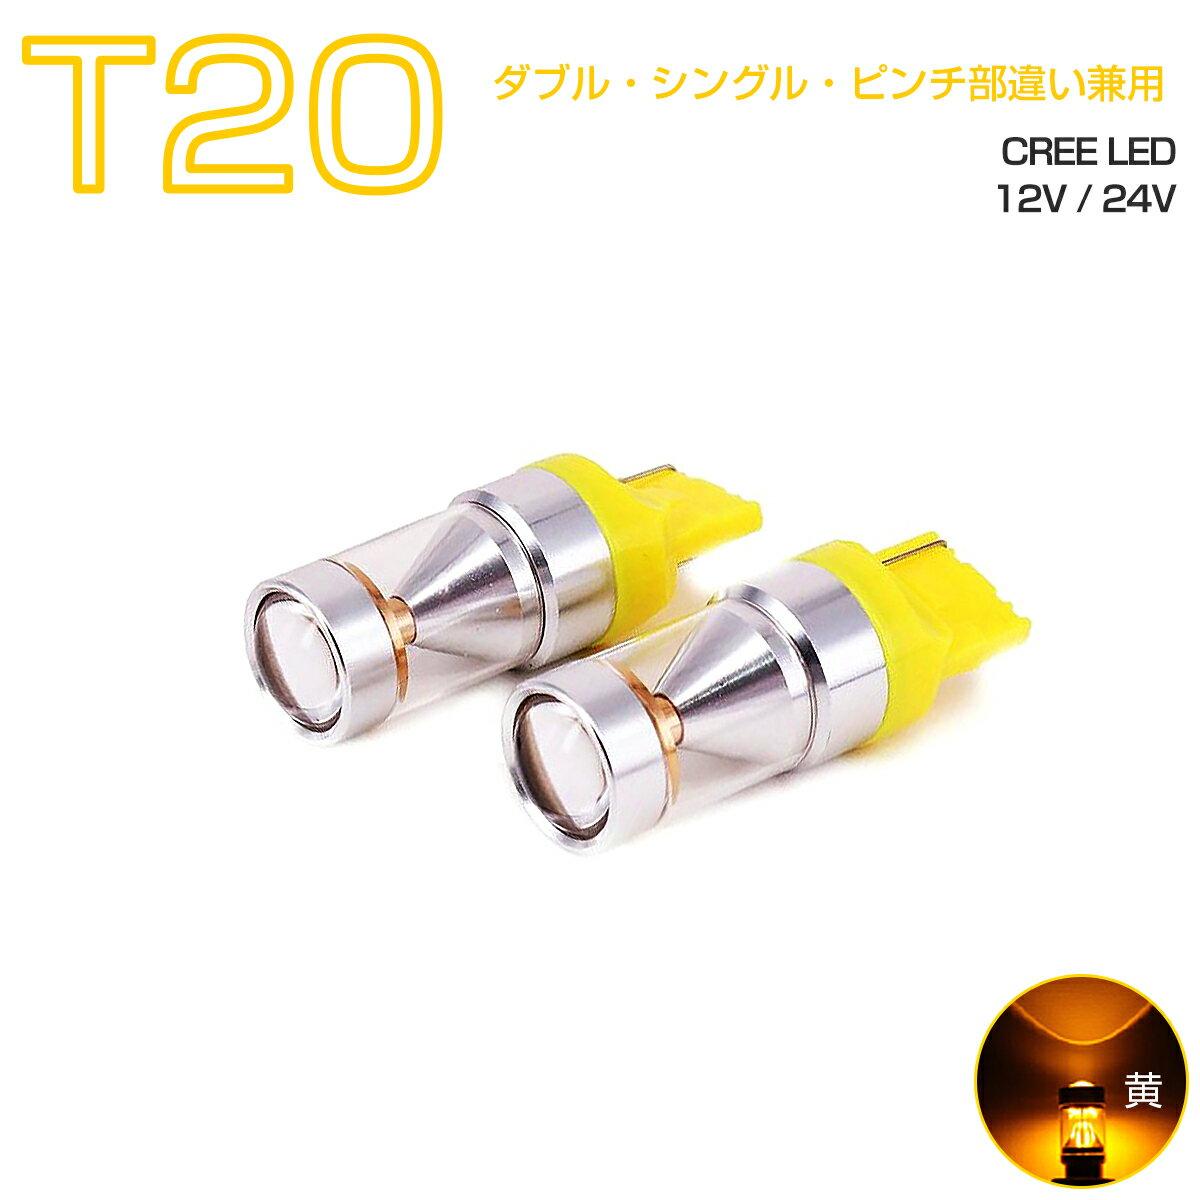 MITSUBISHI グランディス(minor後) H17.6〜H21.3 NA4W ウインカーリア[T20]黄色 LED T20 アンバー 30W CREE 2個入り 12V 24V ネコポス便送料無料 6ヶ月保証 K&M